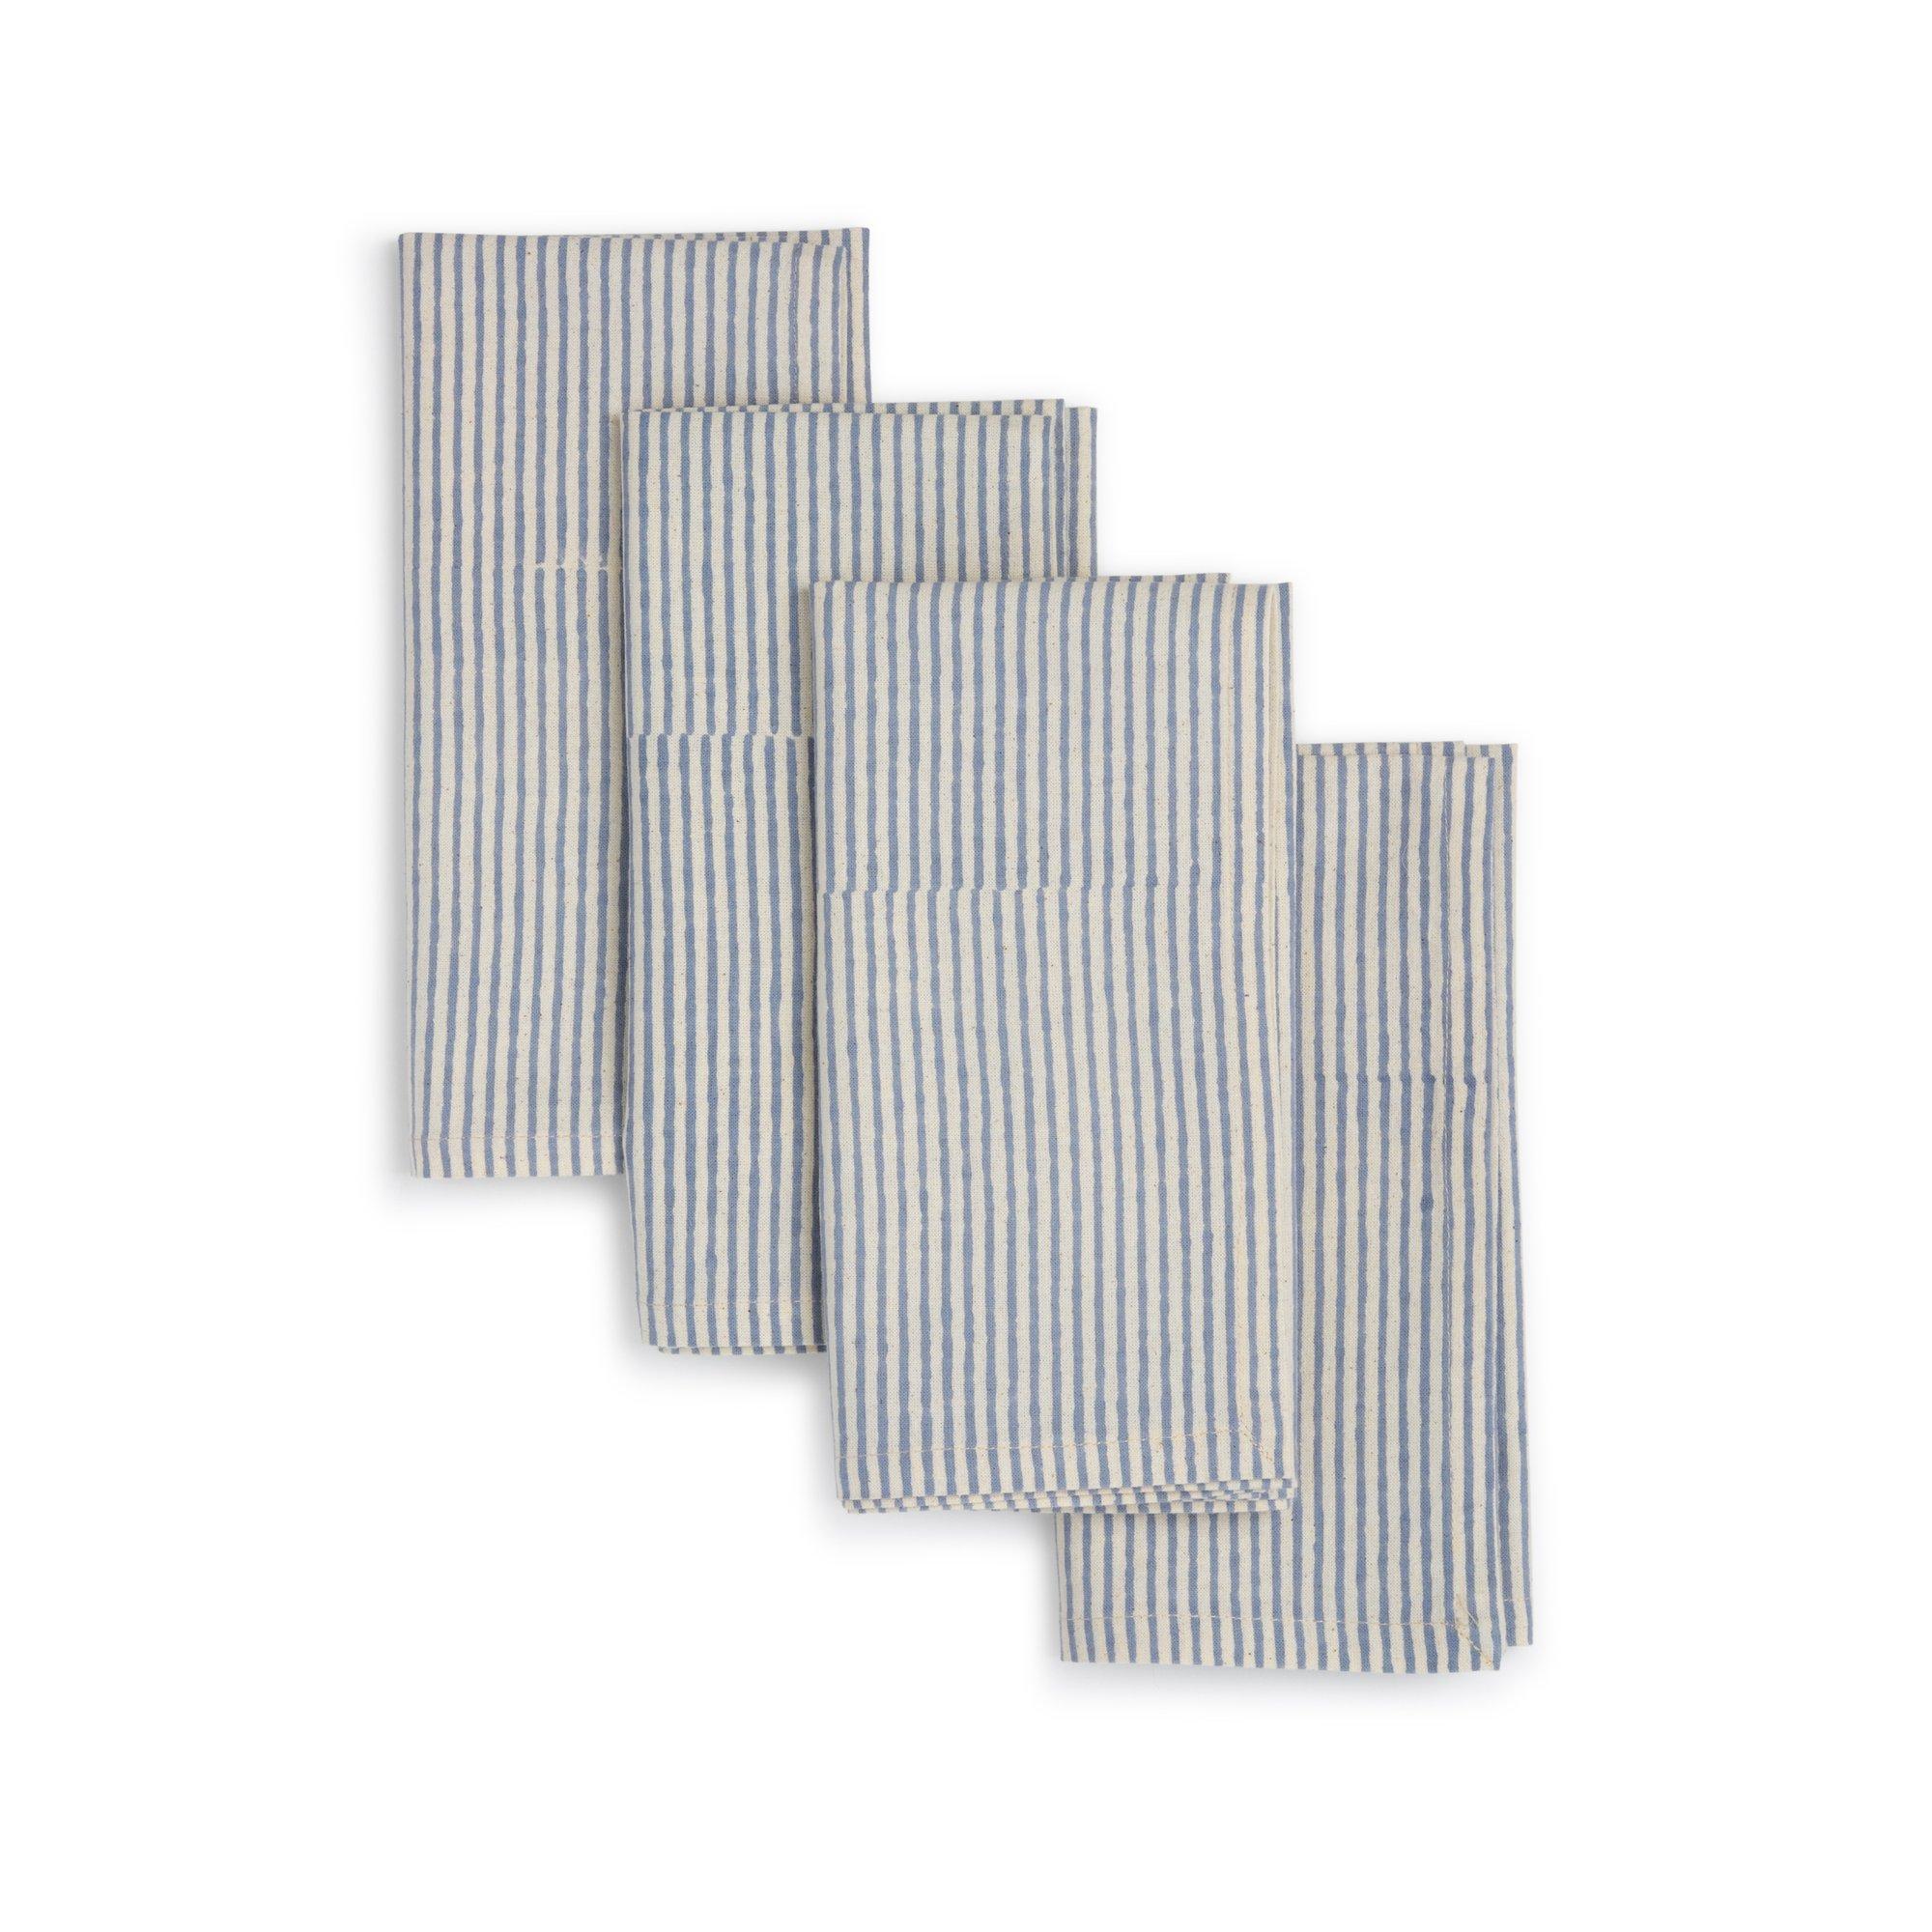 block-printed napkins, 4 set